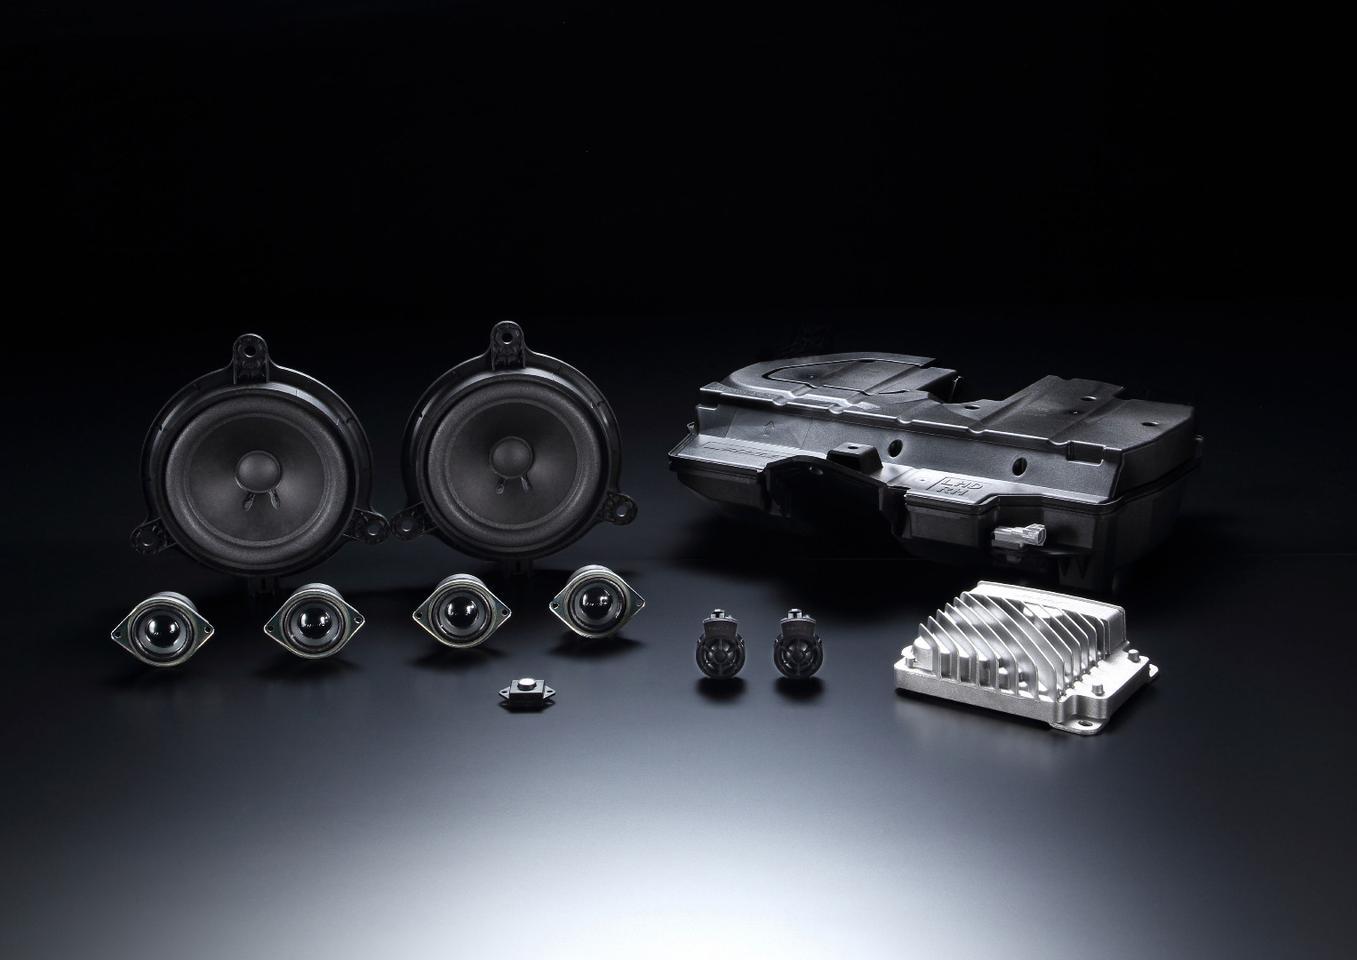 The complete new Bose sound system for the 2016 Mazda Miata